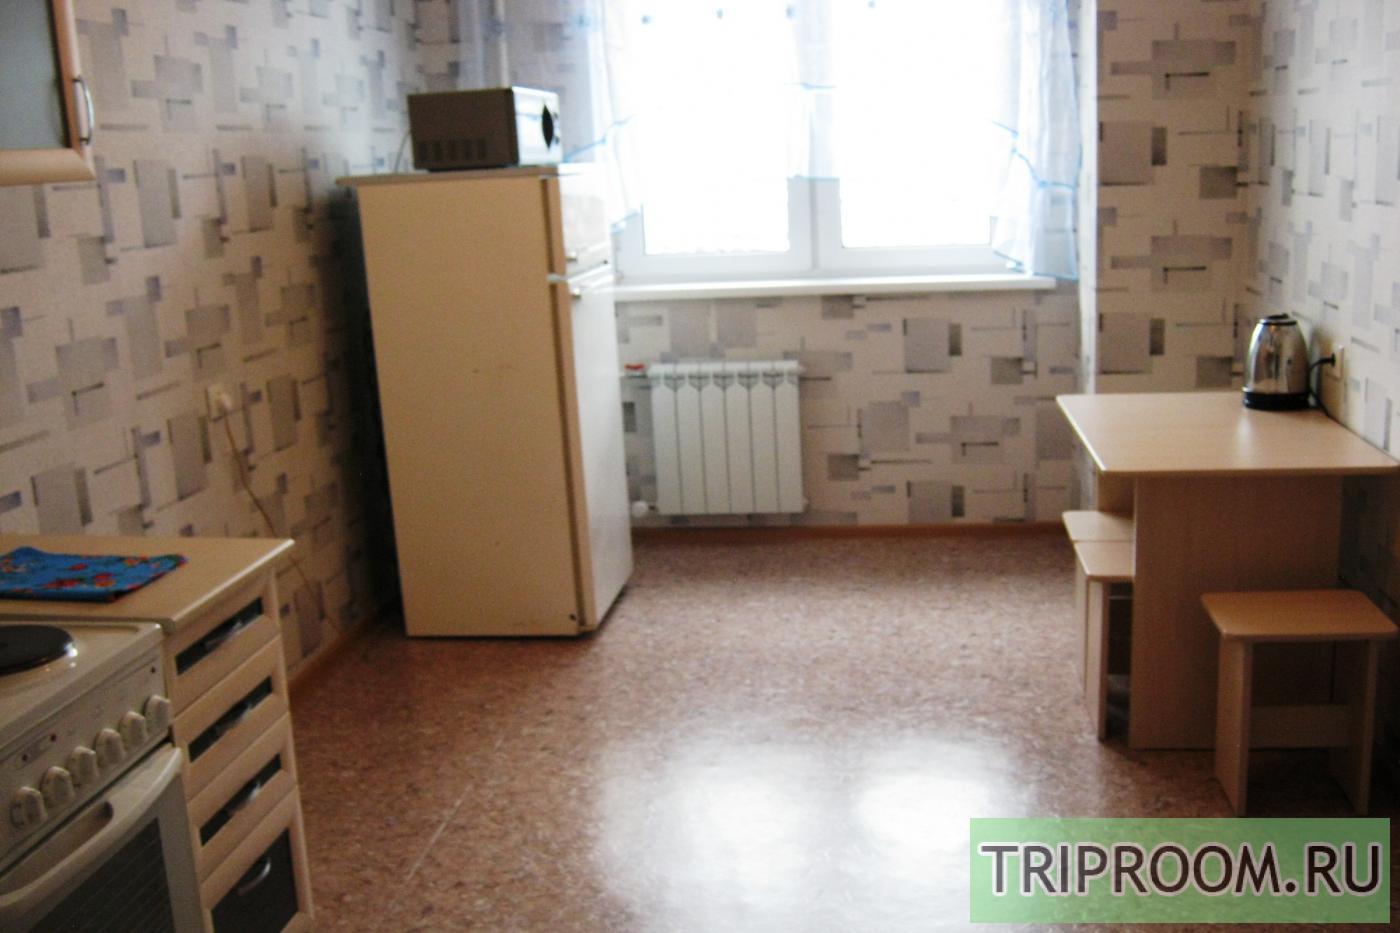 1-комнатная квартира посуточно (вариант № 5896), ул. Алексеева улица, фото № 5